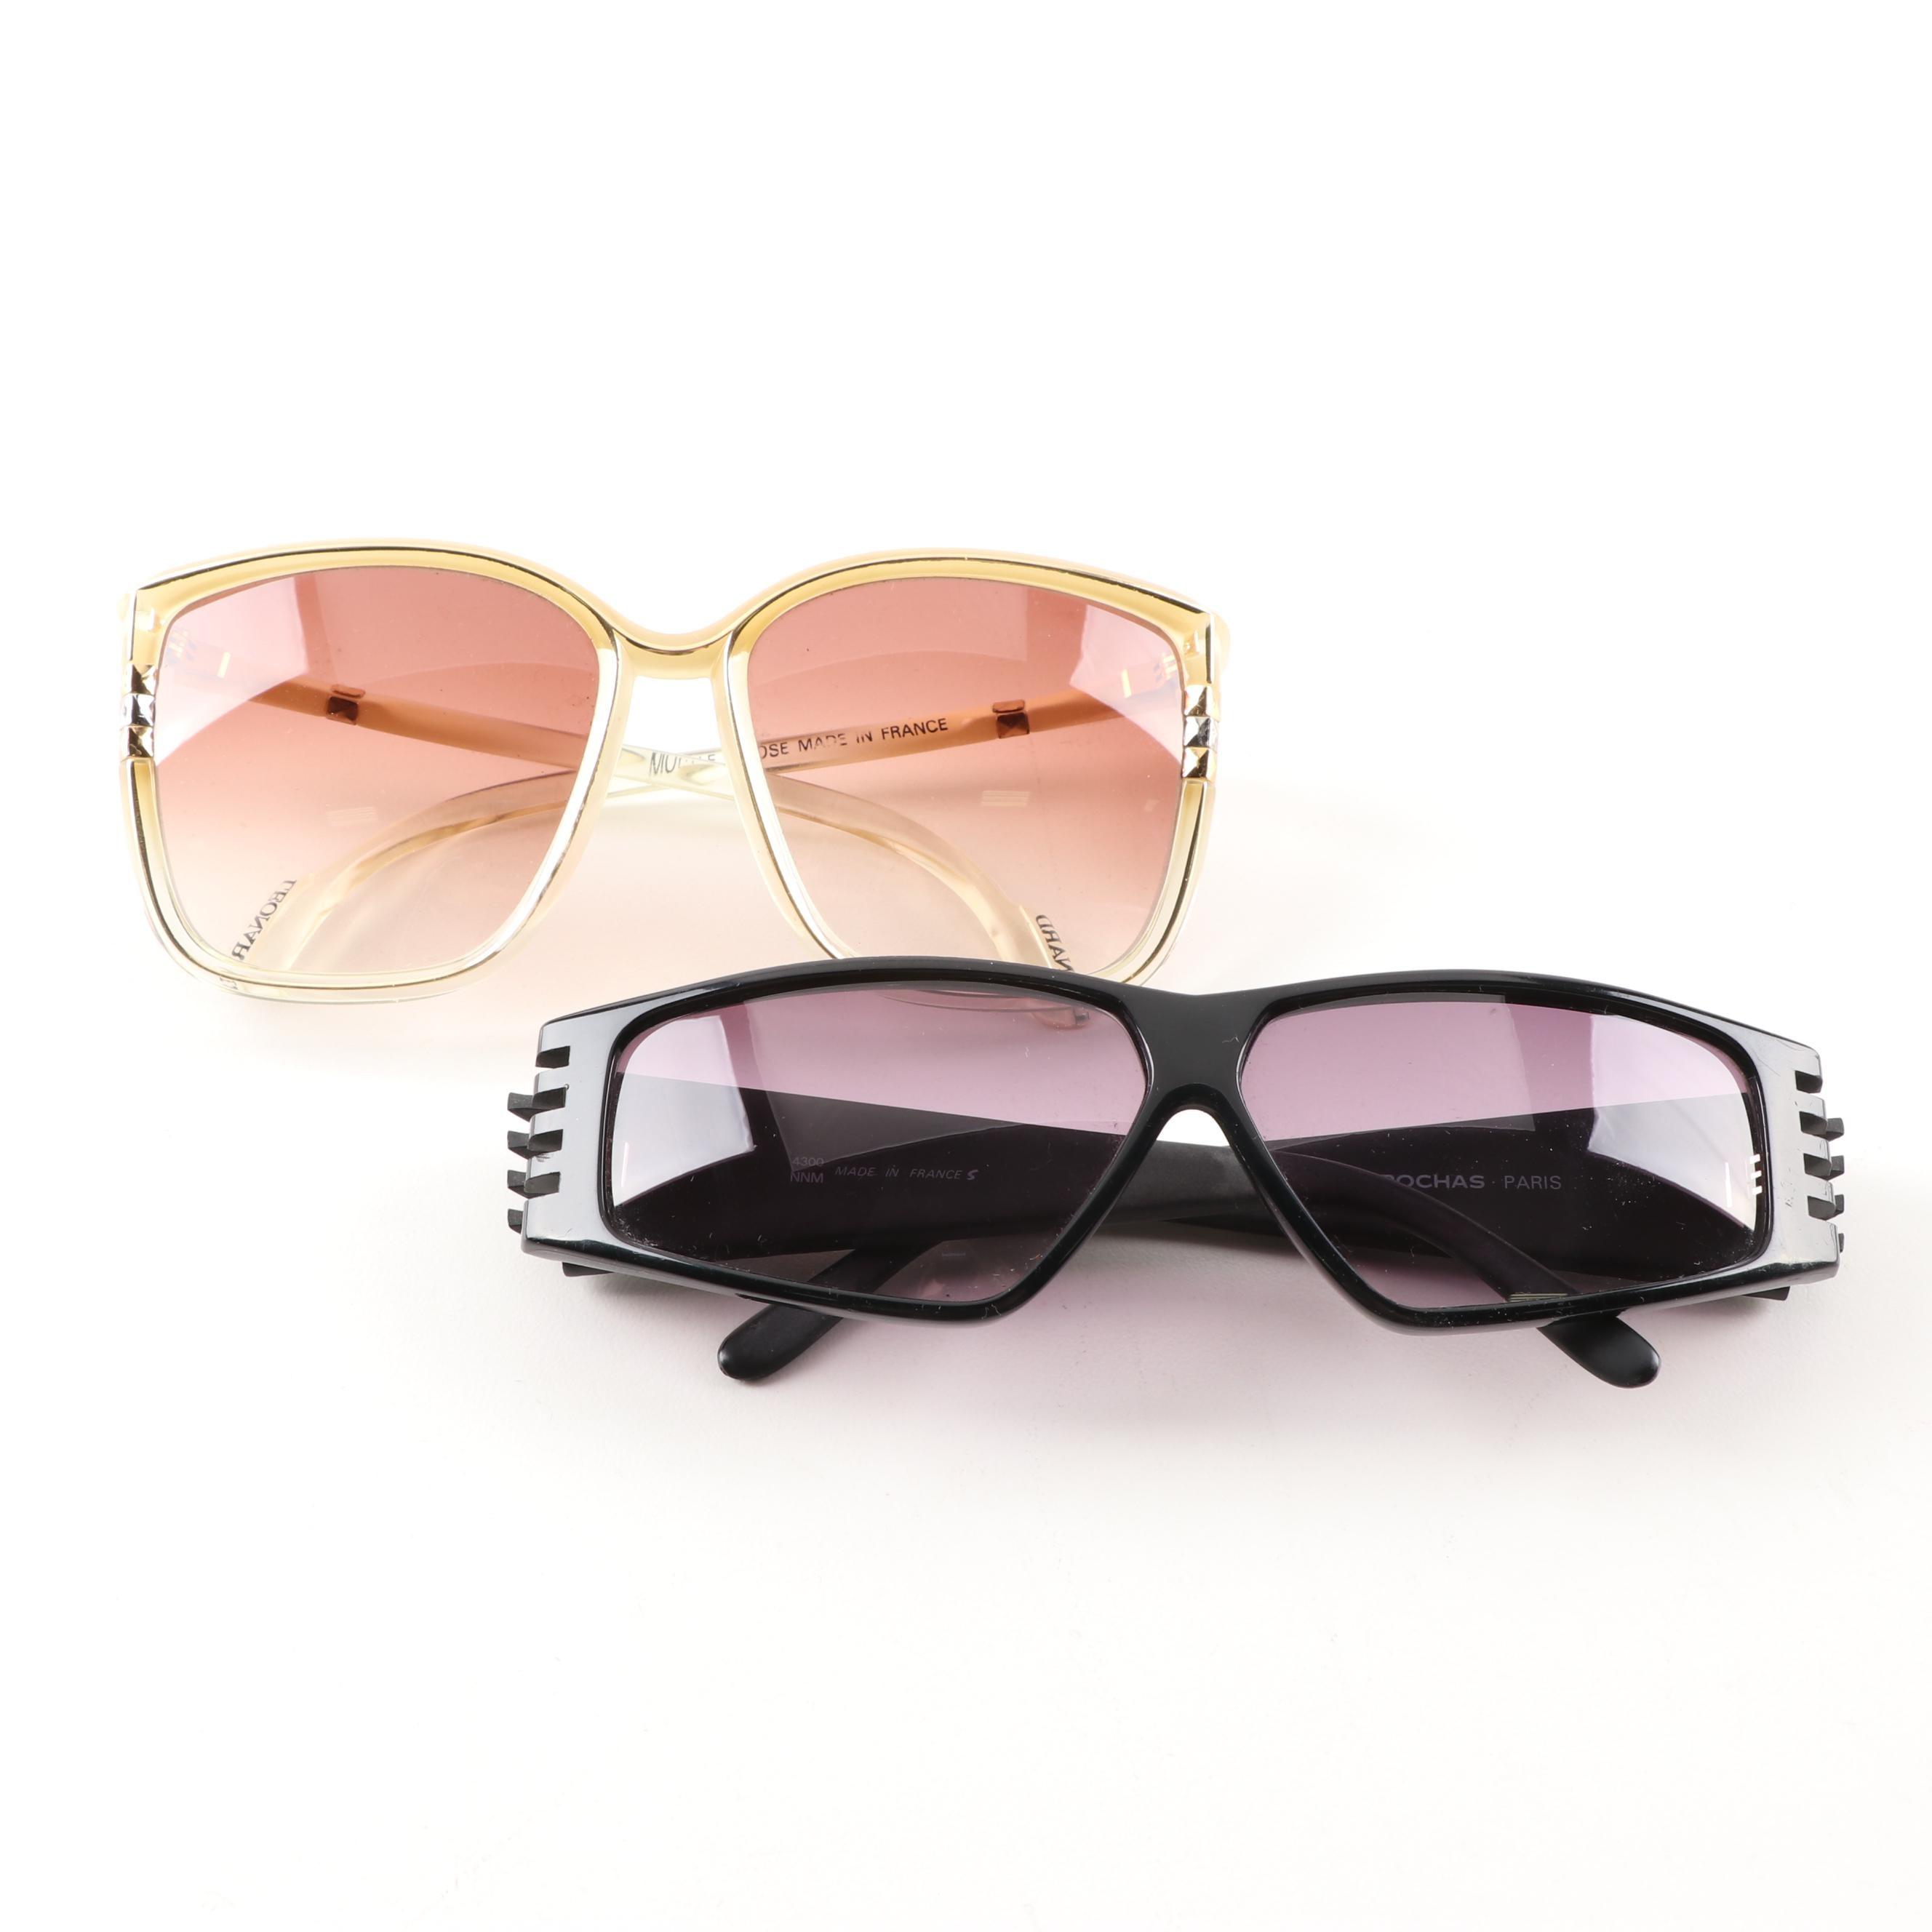 Rochas Paris and Leonard Sunglasses,1980s Vintage